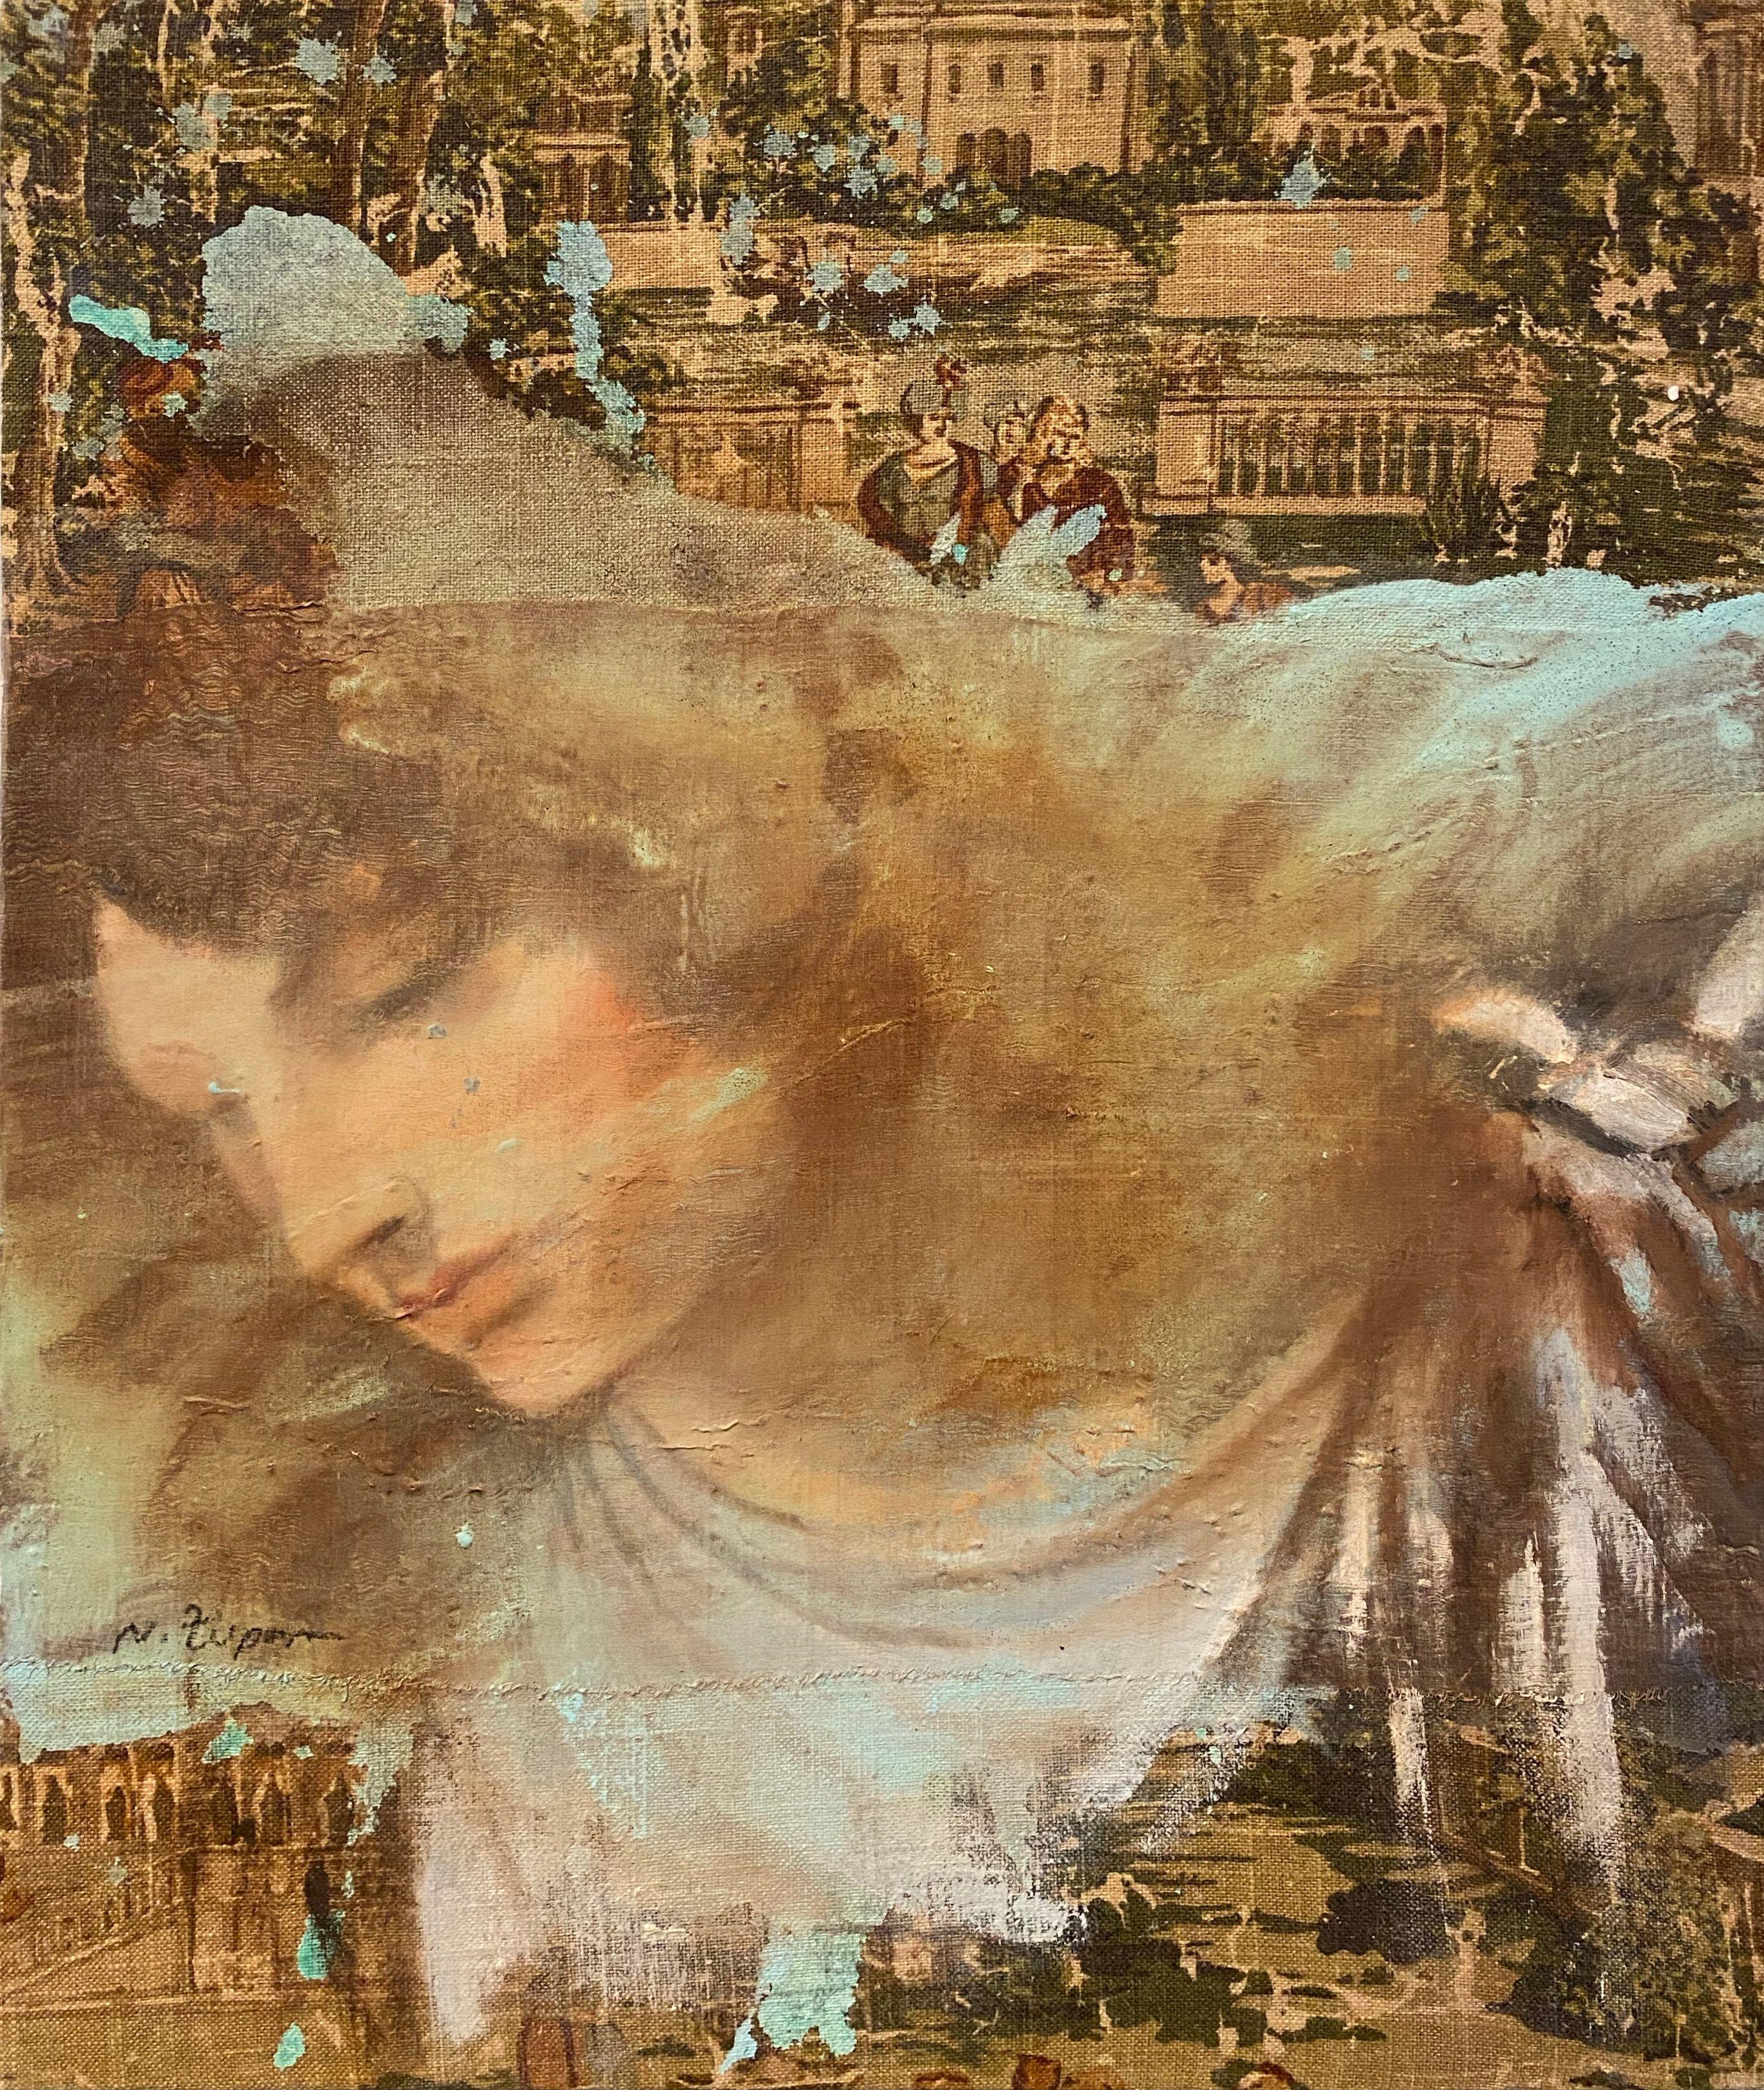 Natasha Zupan - Angel - Painting - Original mixed media on board - Off The Wall Gallery Houston